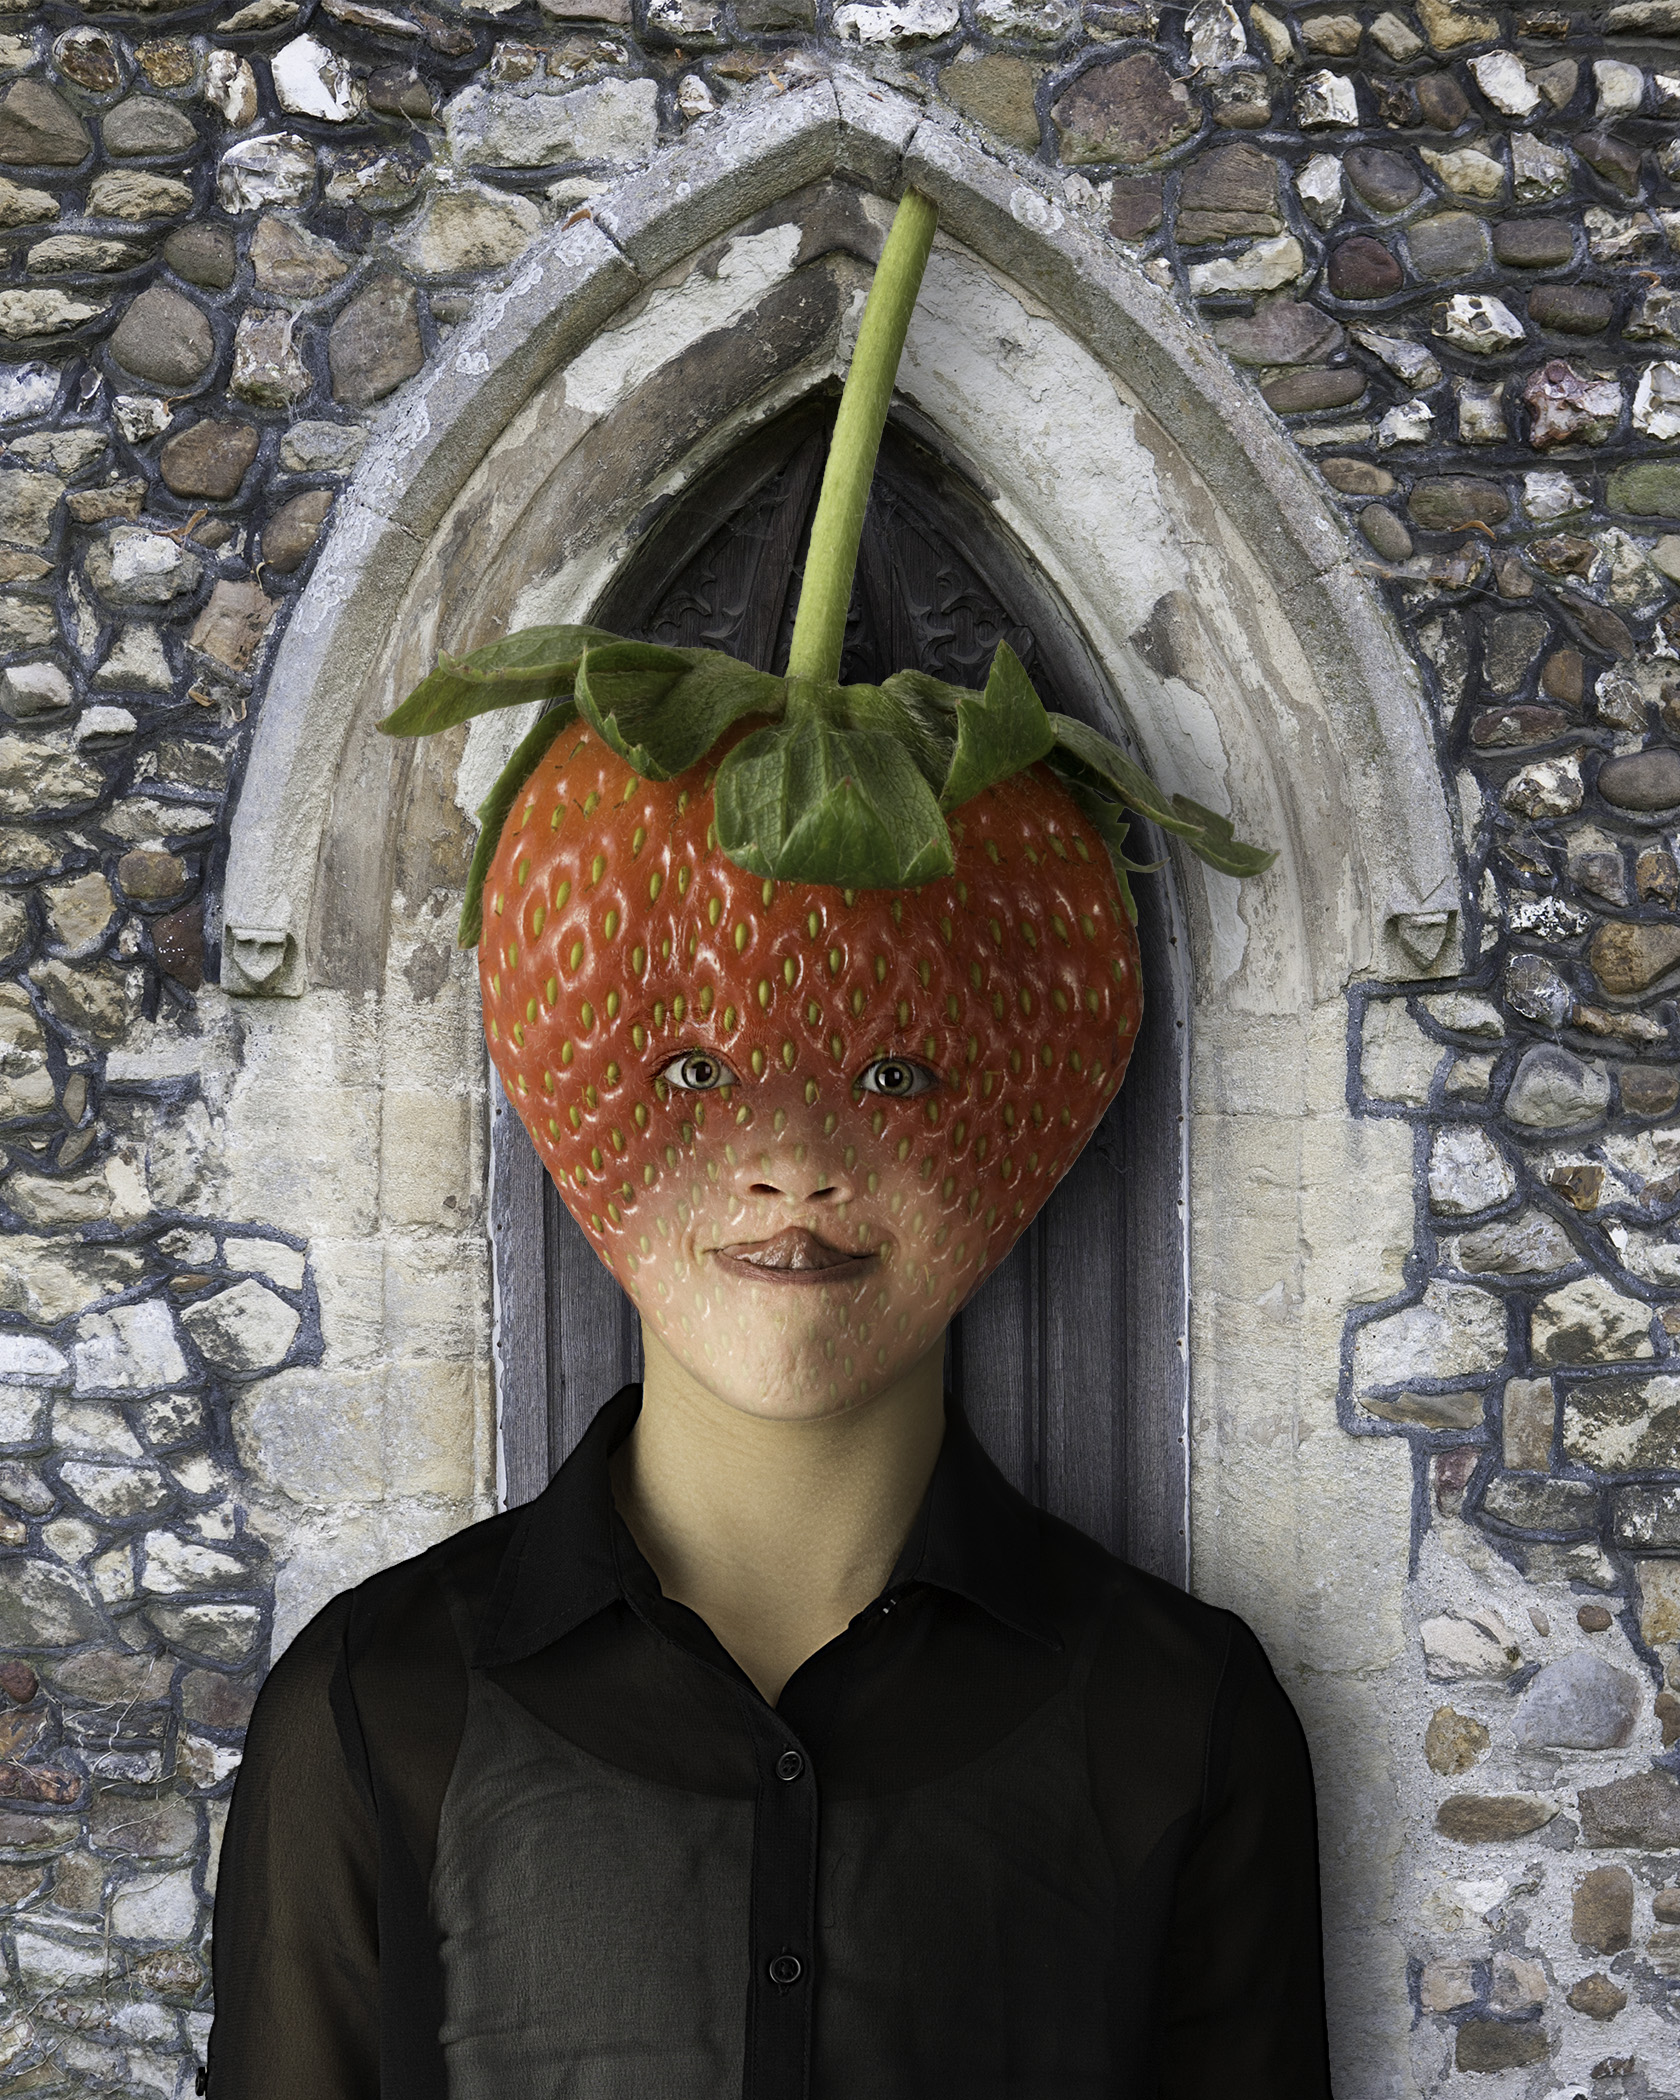 Mack strawberry2.jpg